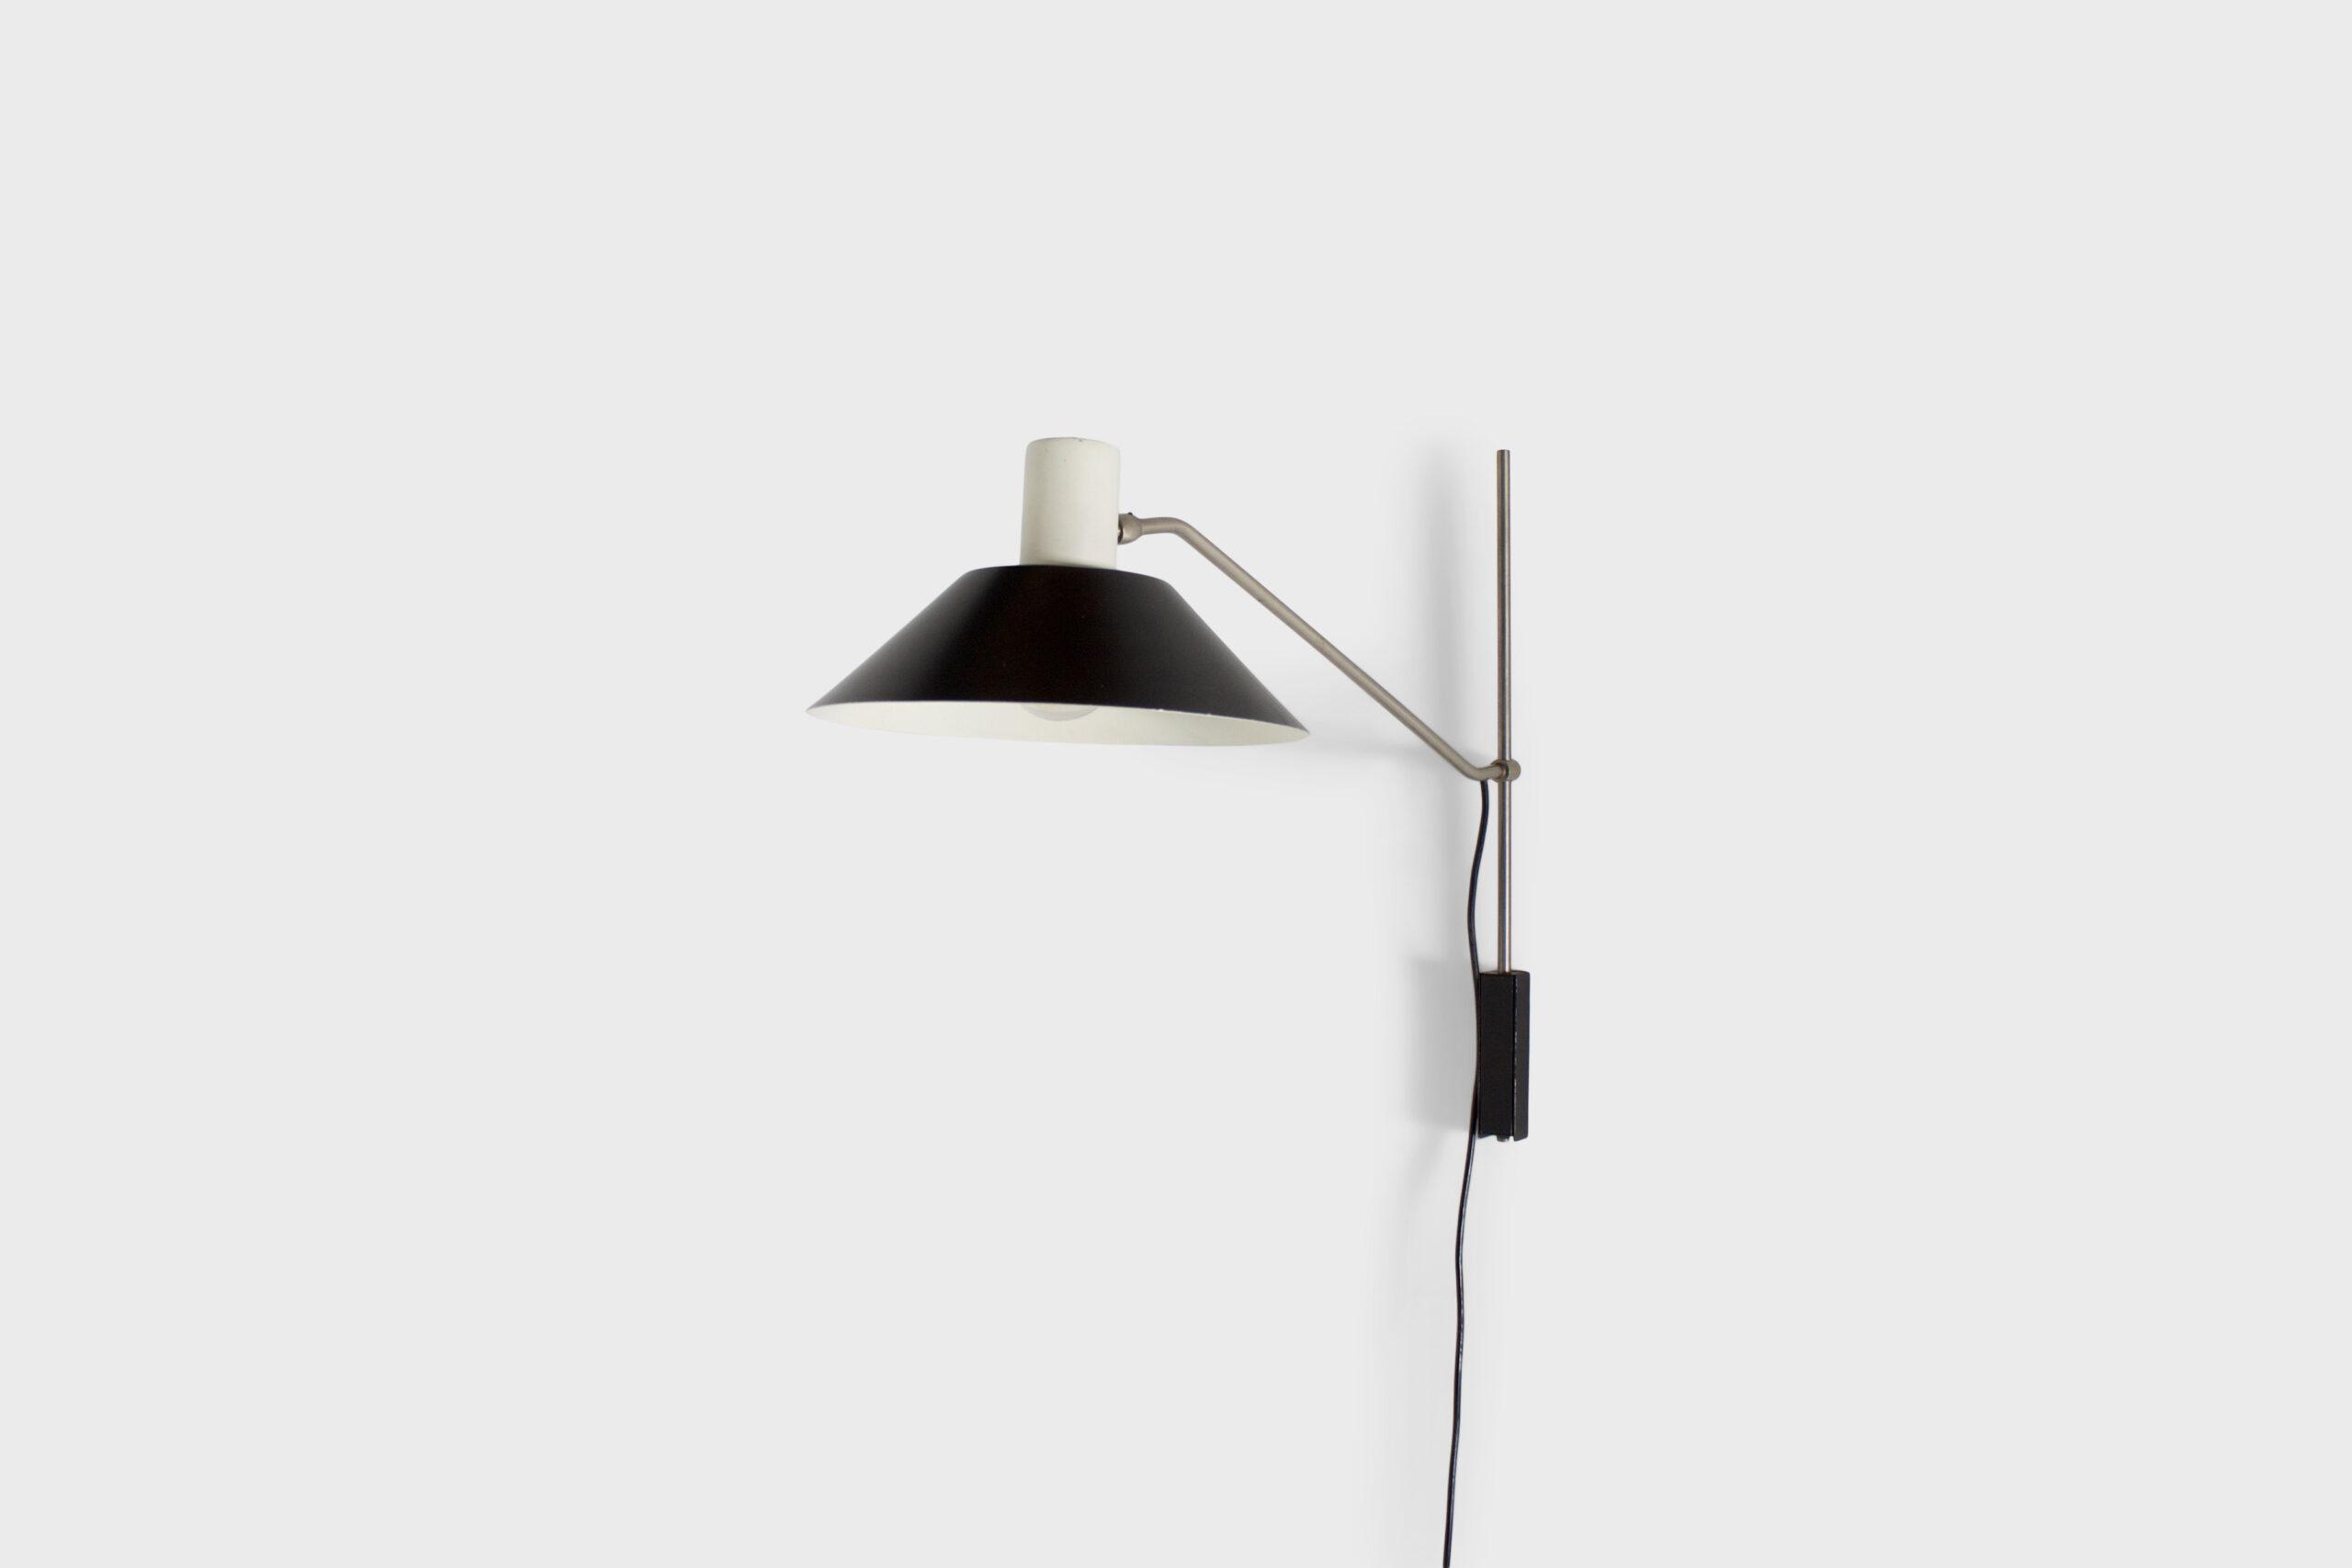 Wall Lamp 7078 by Jan Hoogervorst for Anvia